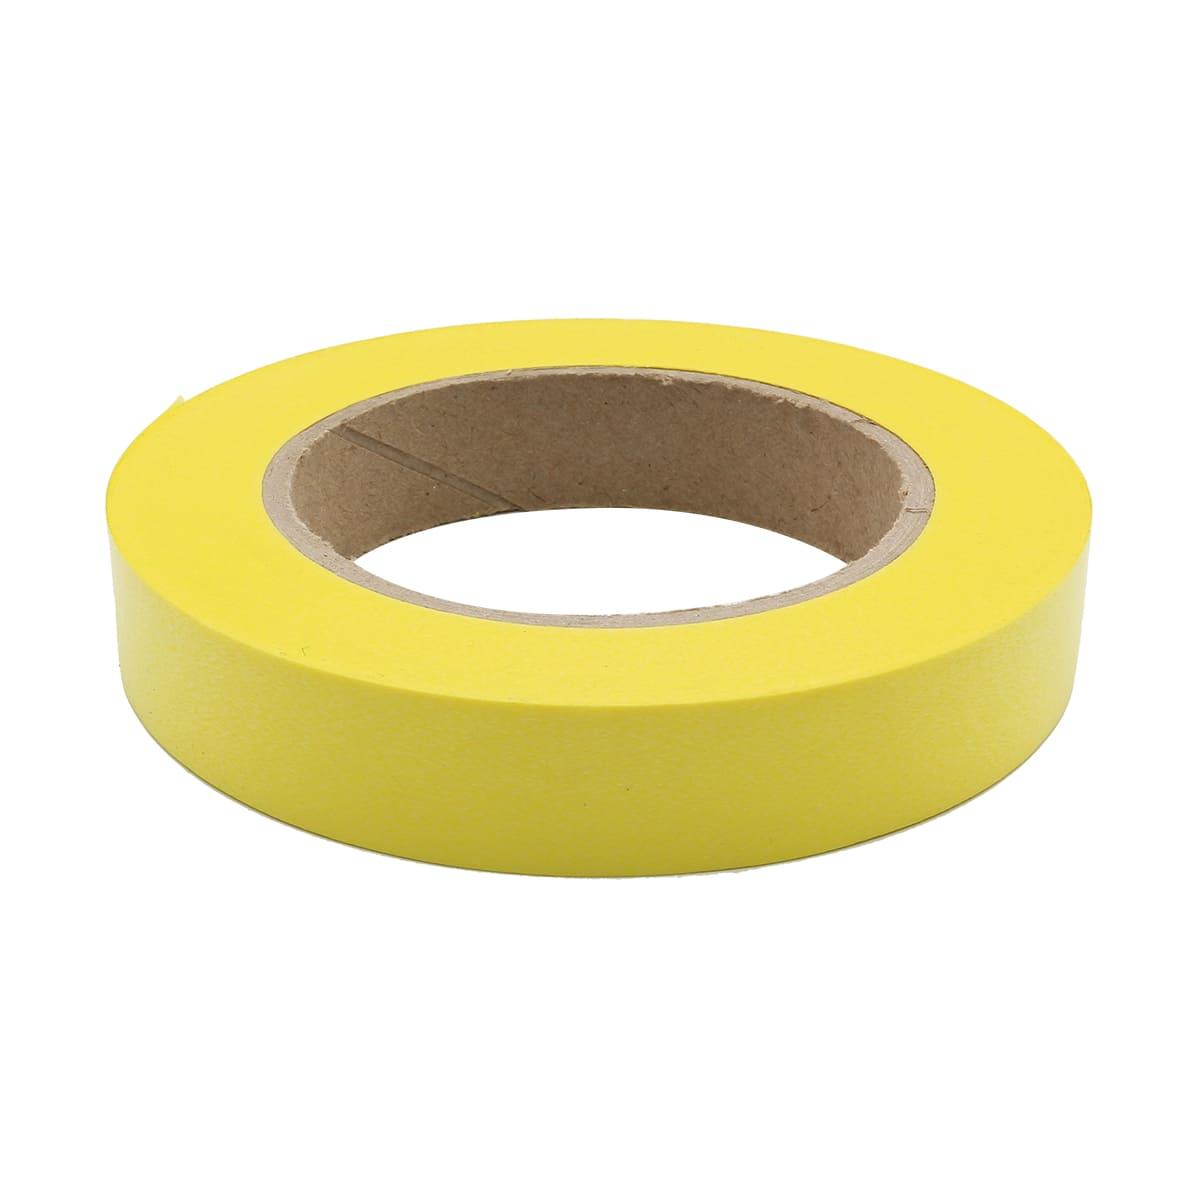 59613 Лента простая 2/50 однотонная гладкая Р295 желтая